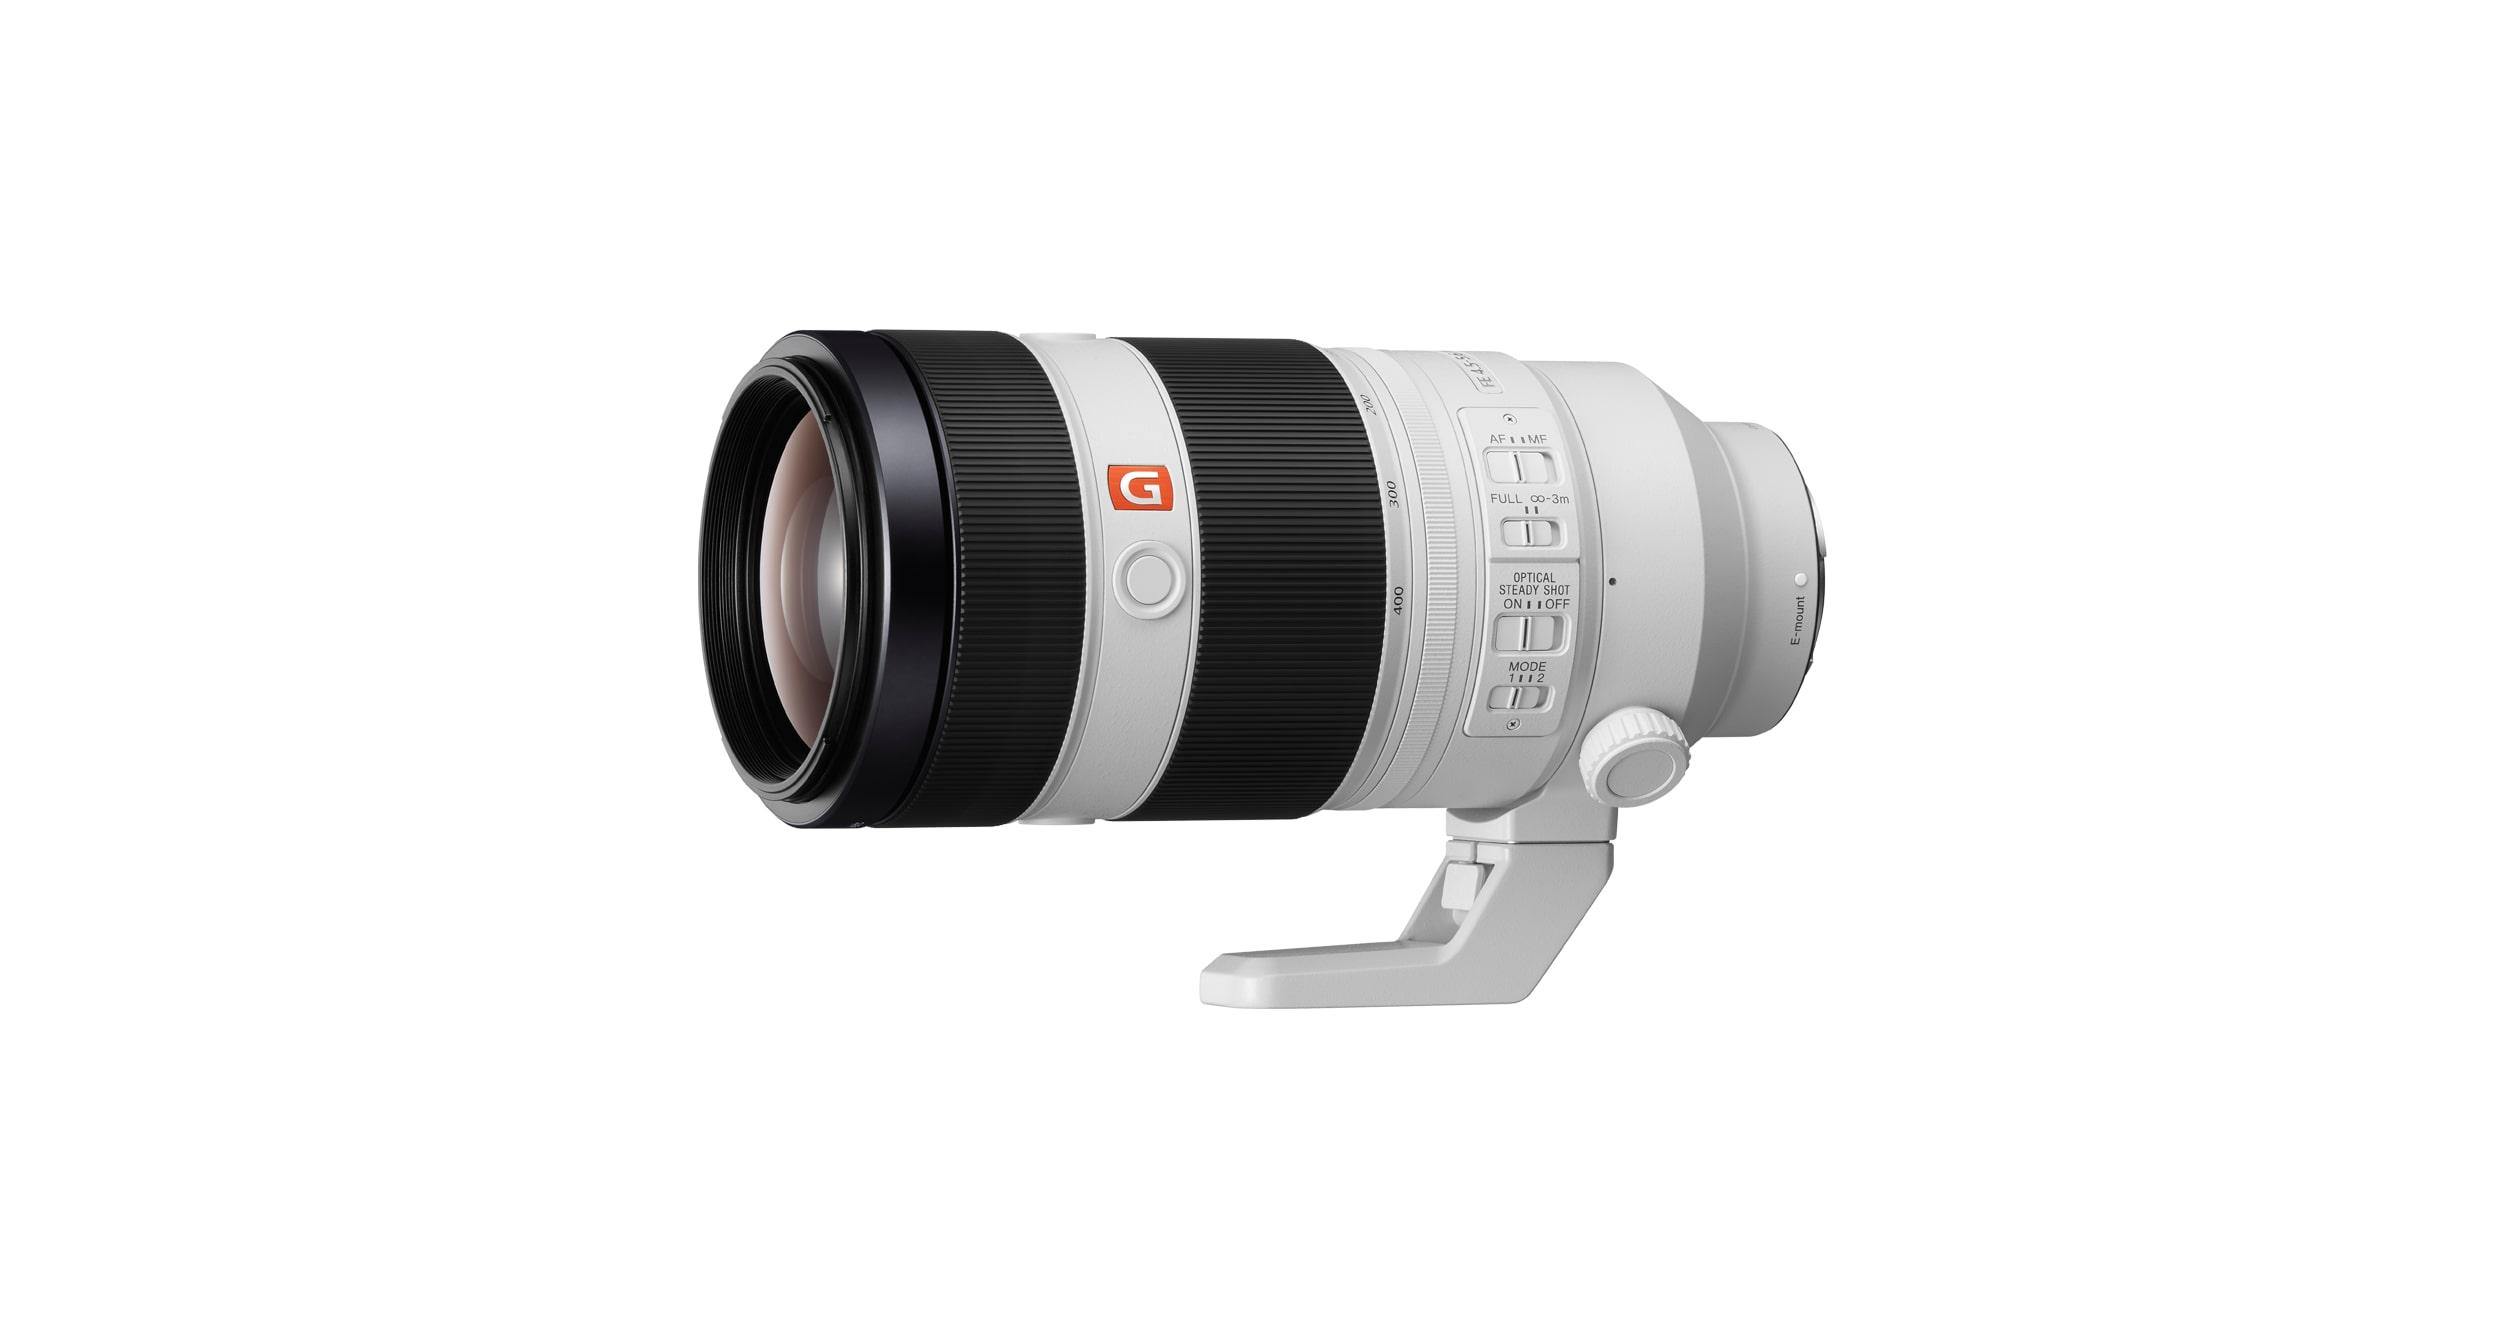 Sony FE 100-400mm super-telephoto zoom G Master lens